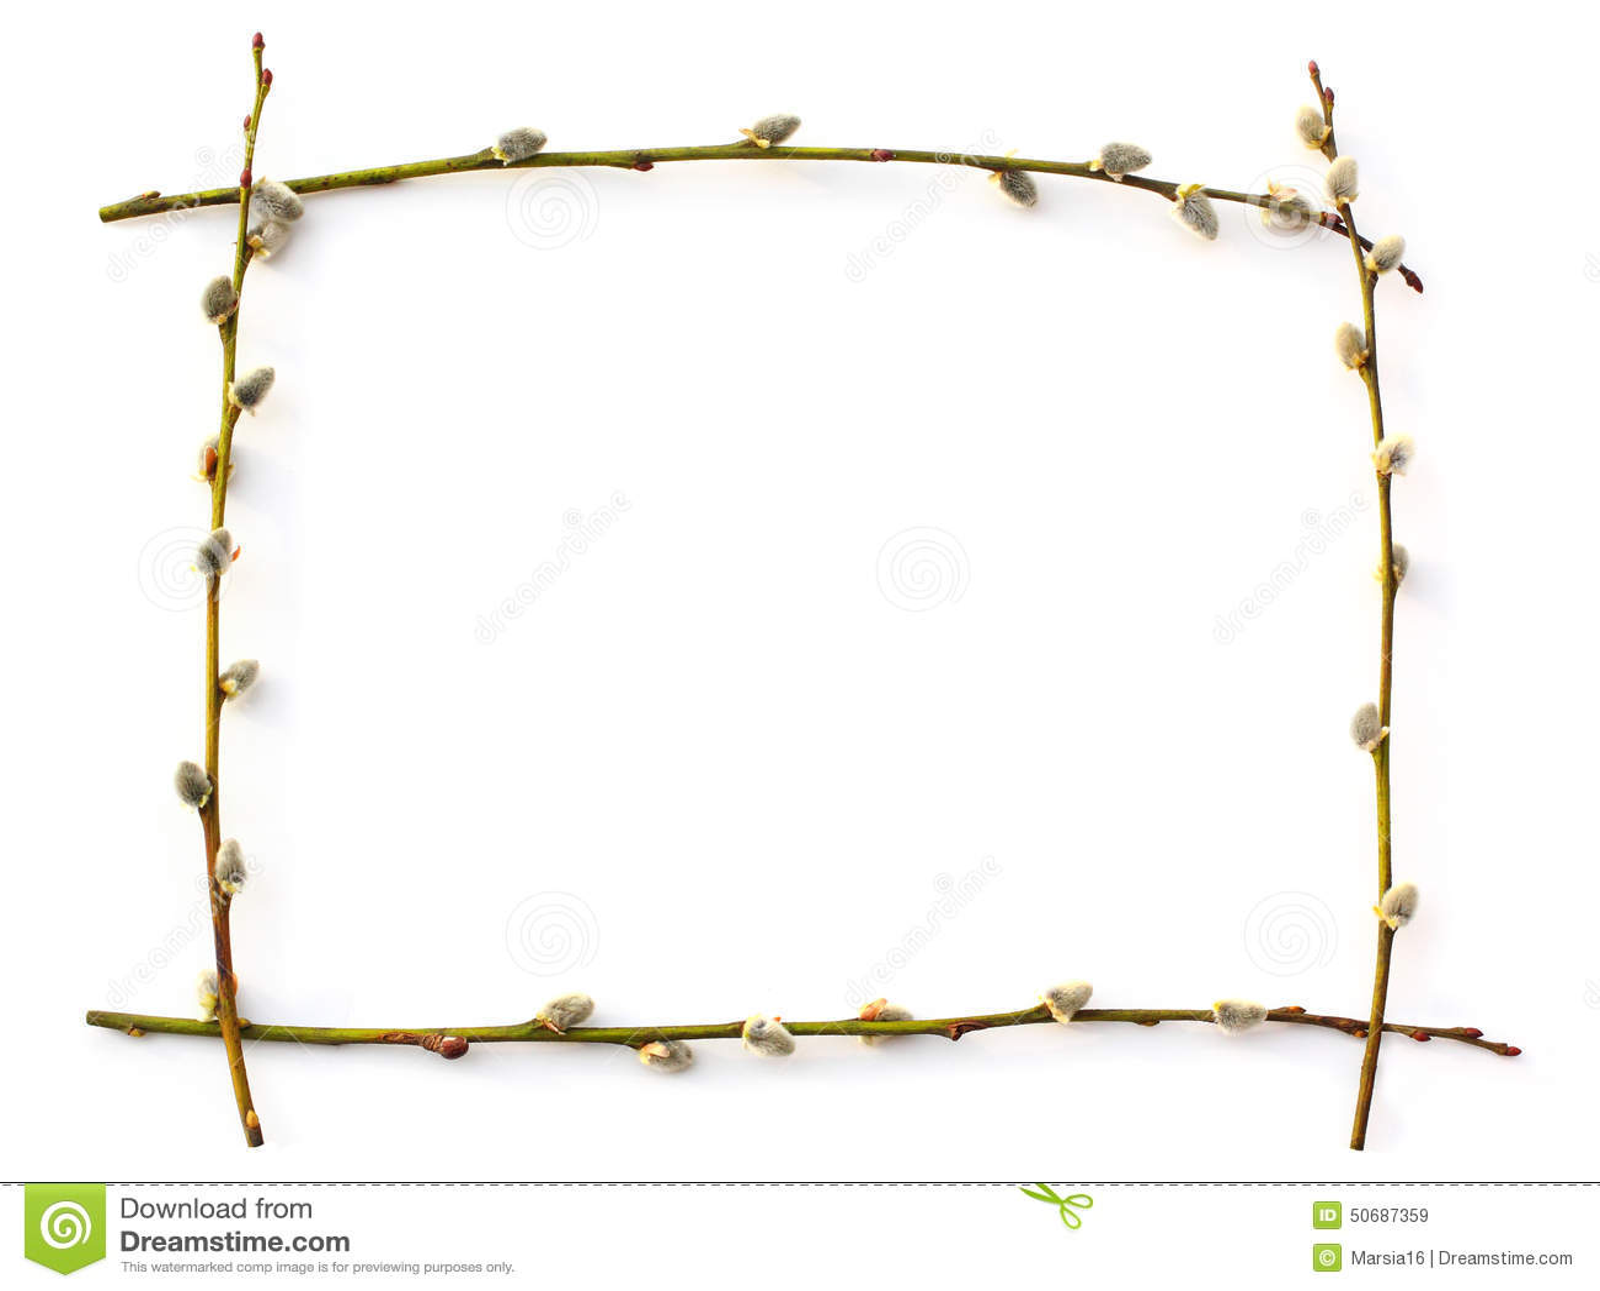 Download 在白色的长方形褪色柳框架 库存图片. 图片 包括有 长方形, 象征性, 框架, 国界的, 卖花人, budd - 50687359